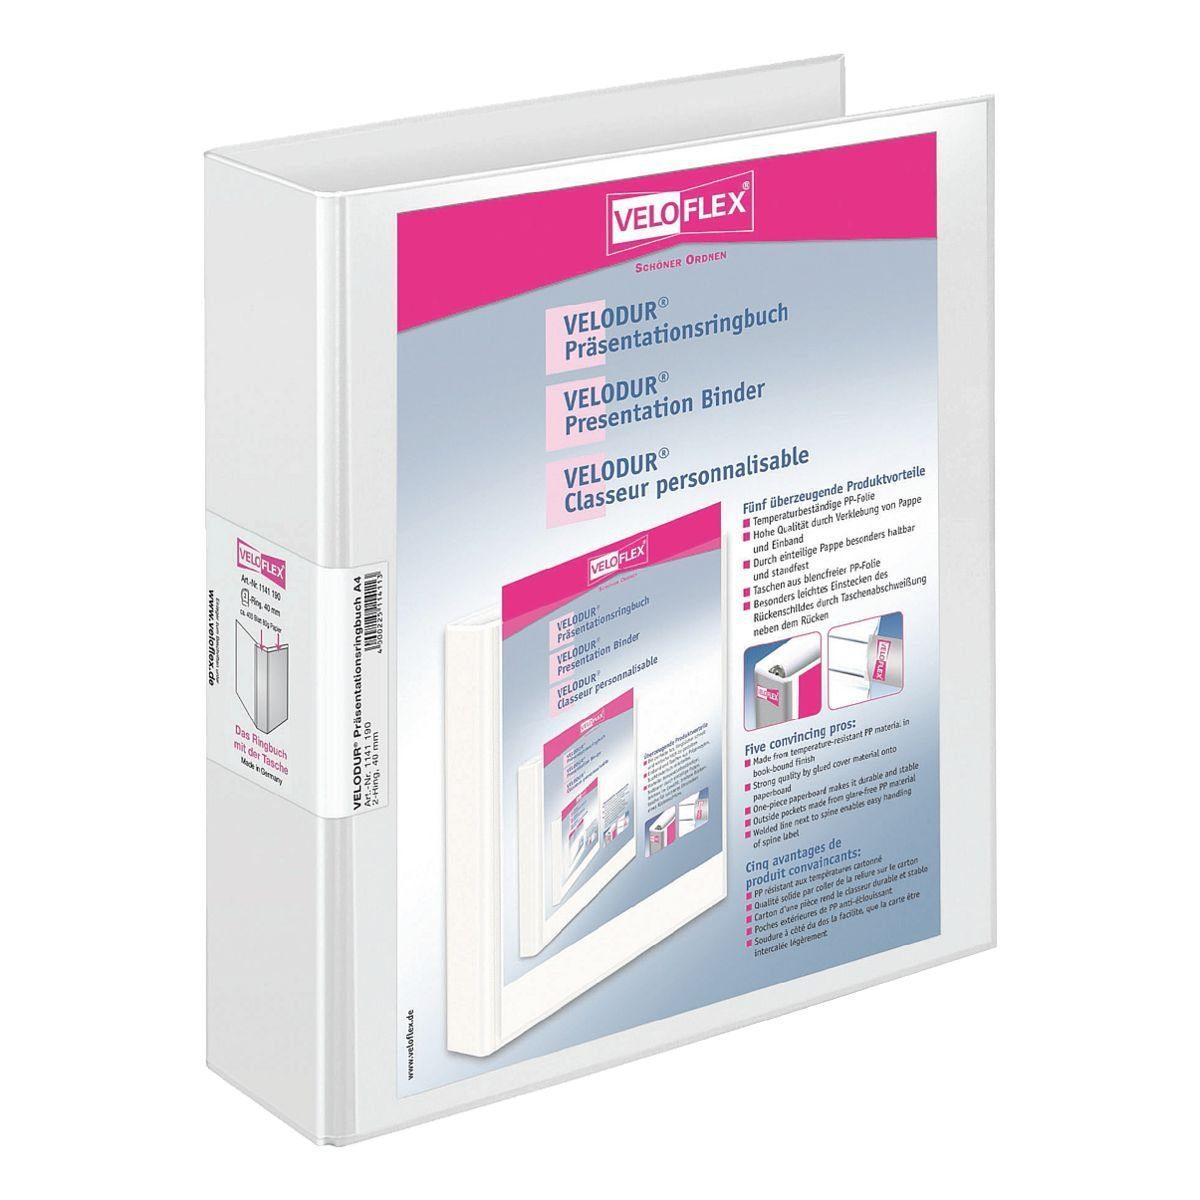 VELOFLEX Präsentationsringbuch (2 Ringe) bis 400 Blatt A4 »VELODUR® 11411«